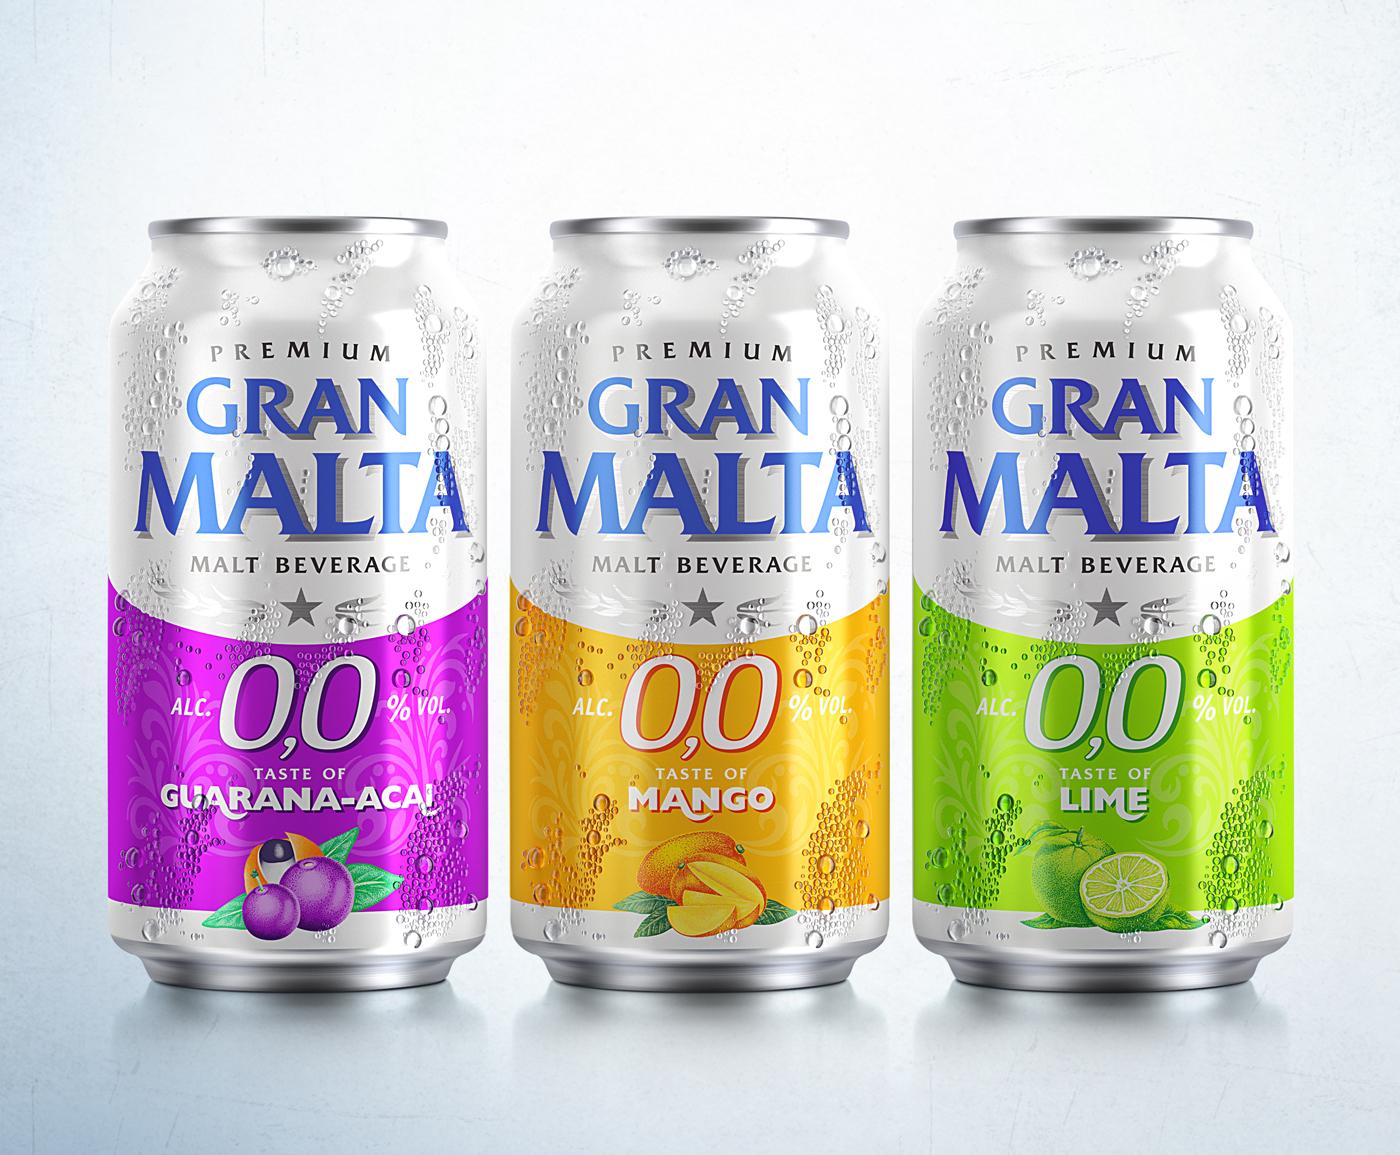 Gran Malta – malt beverage